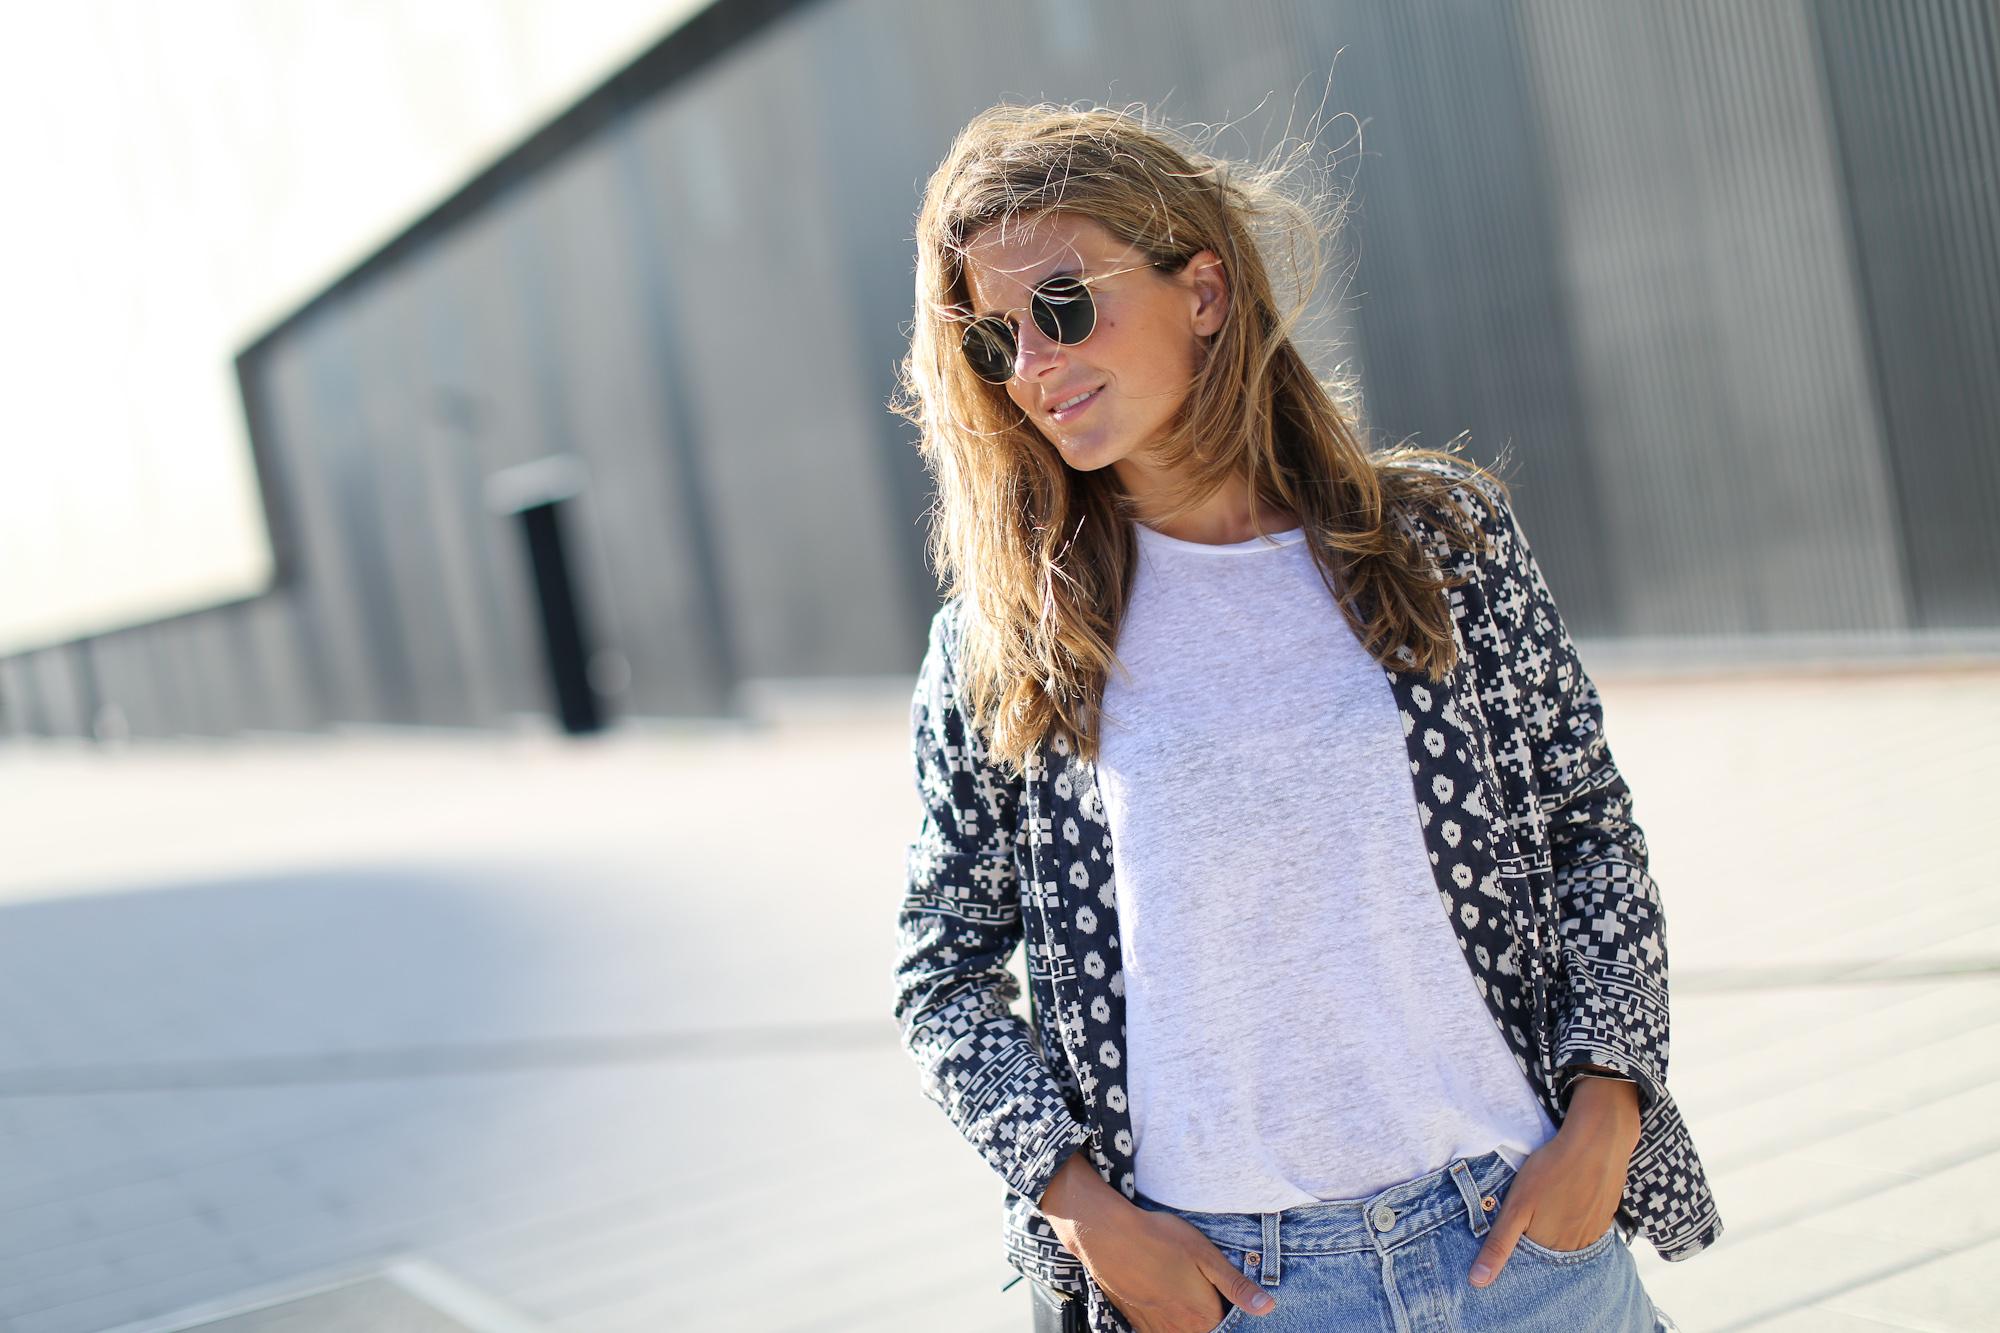 Clochet_streetstyle_mango_ethnic_kimono_levis_501_vintage_leather_espadrilles-7